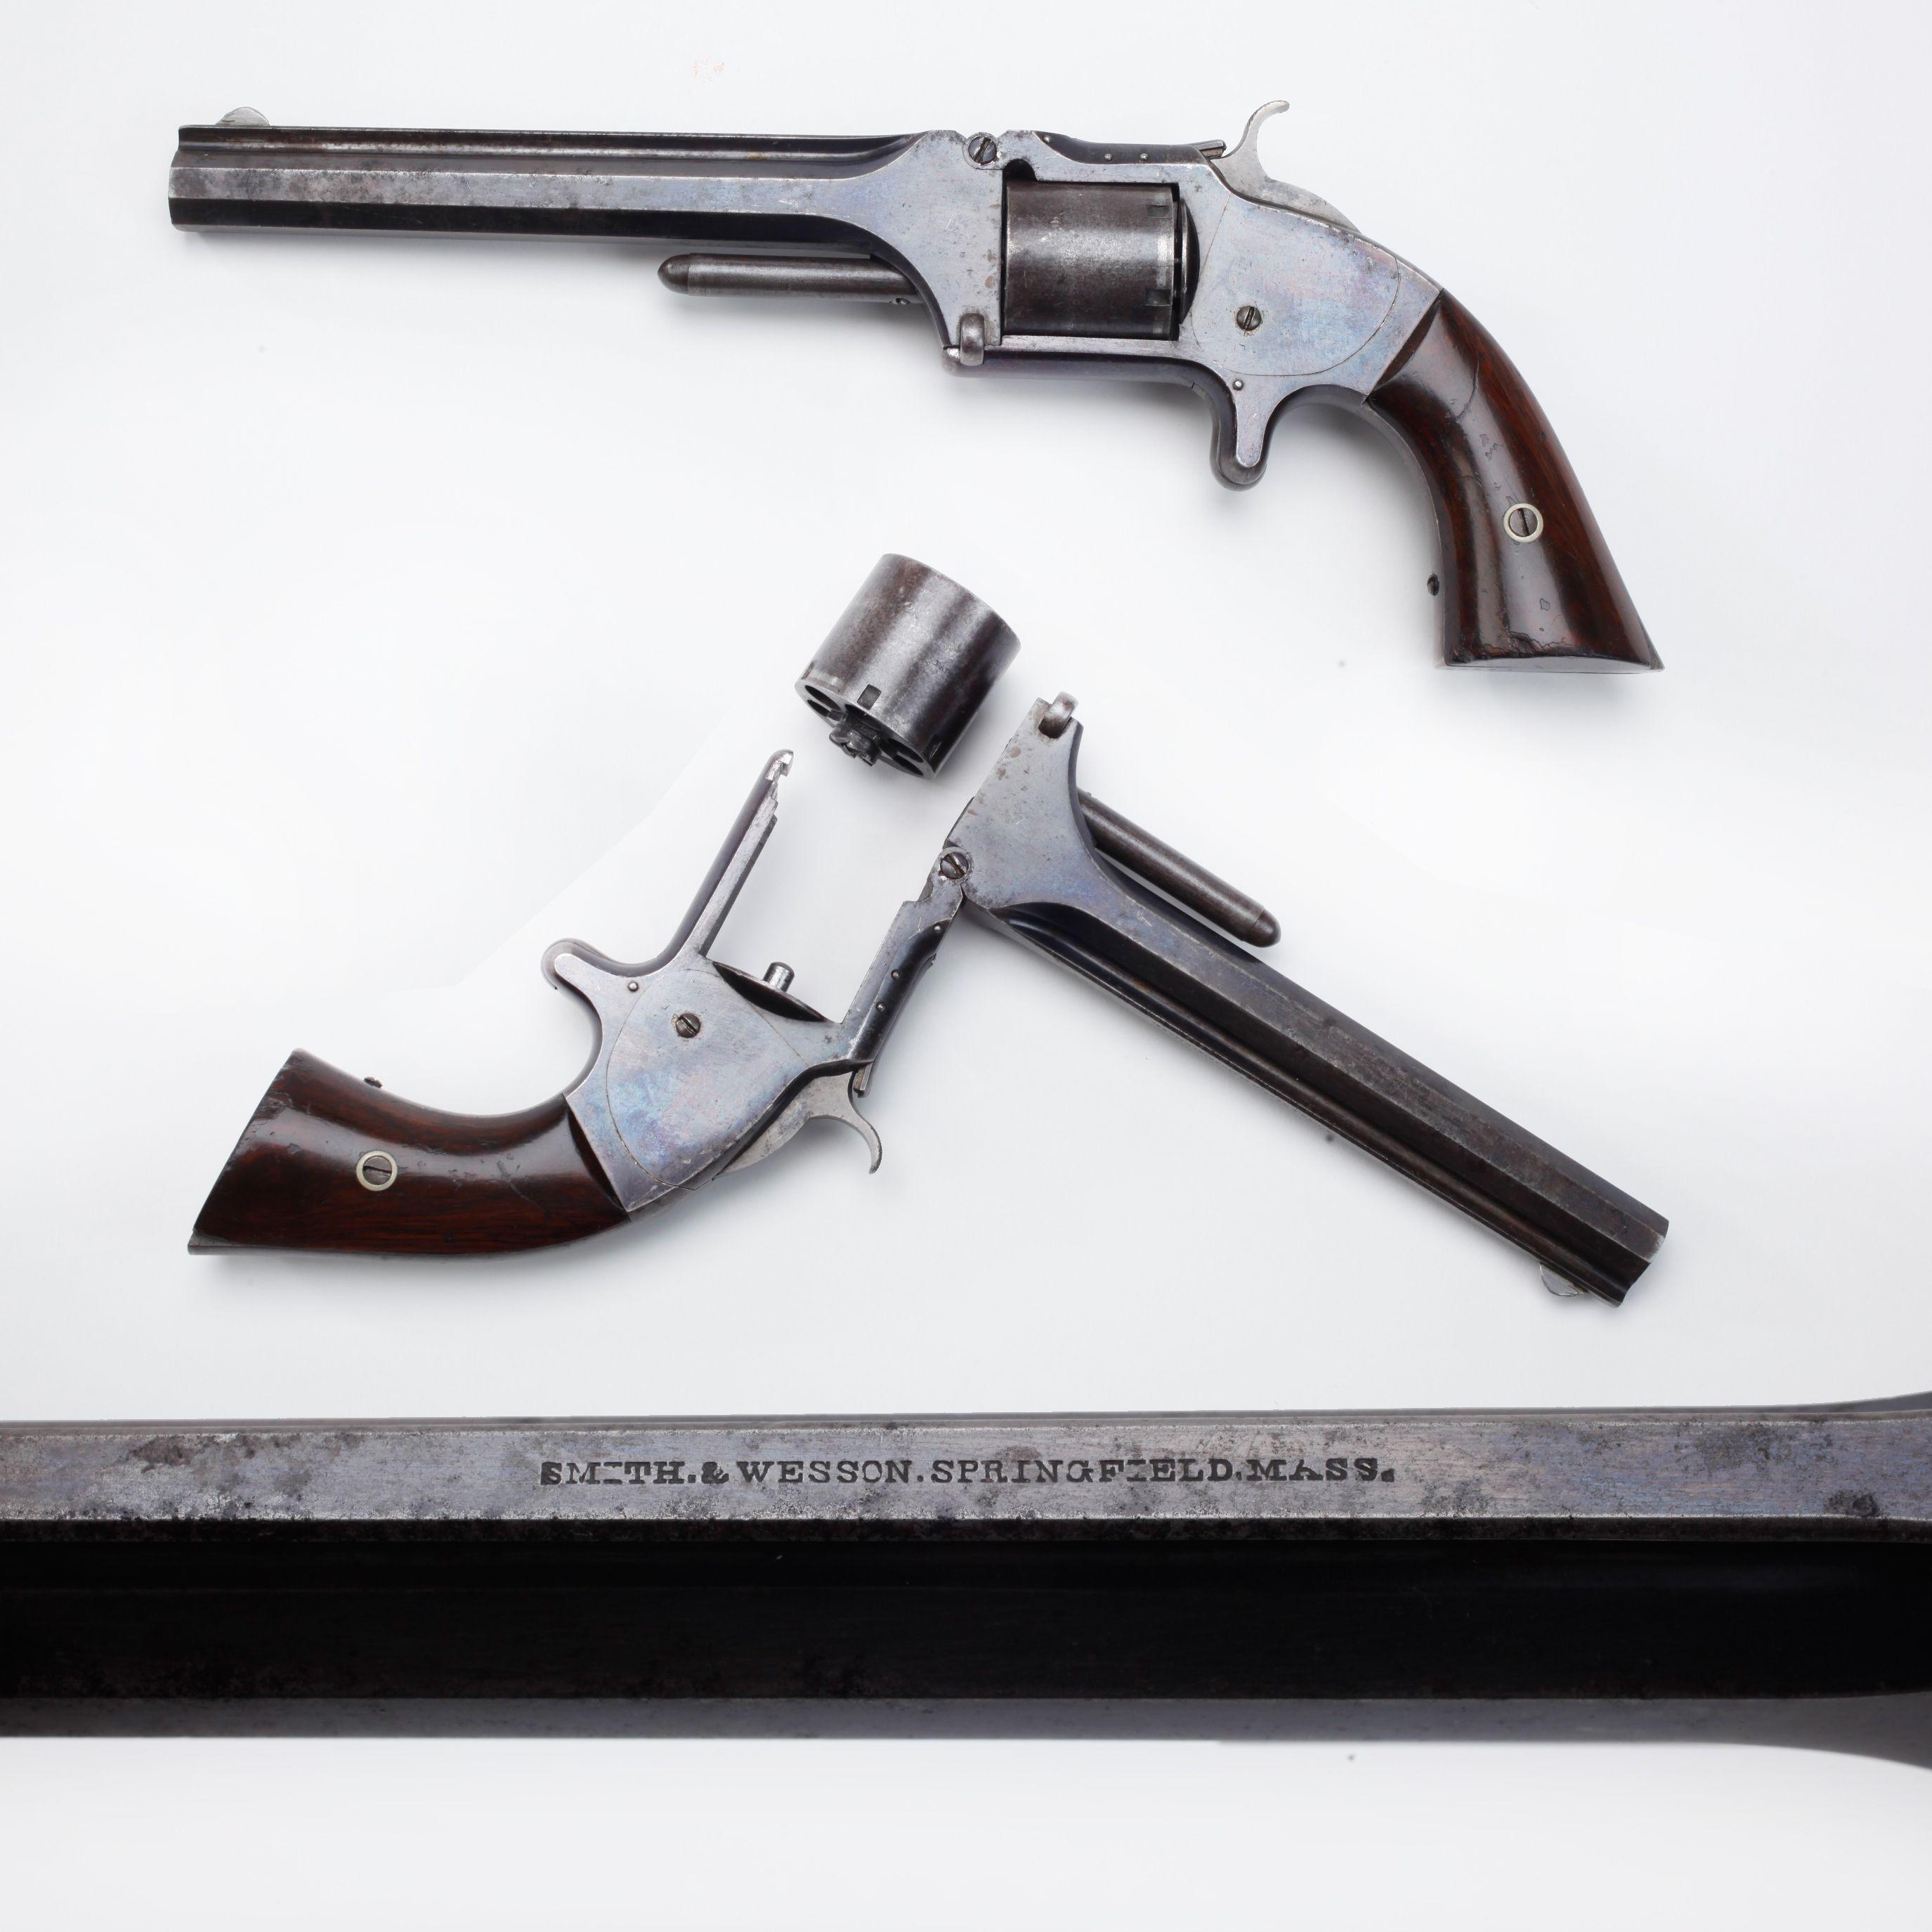 dating s&w revolvers Tønder